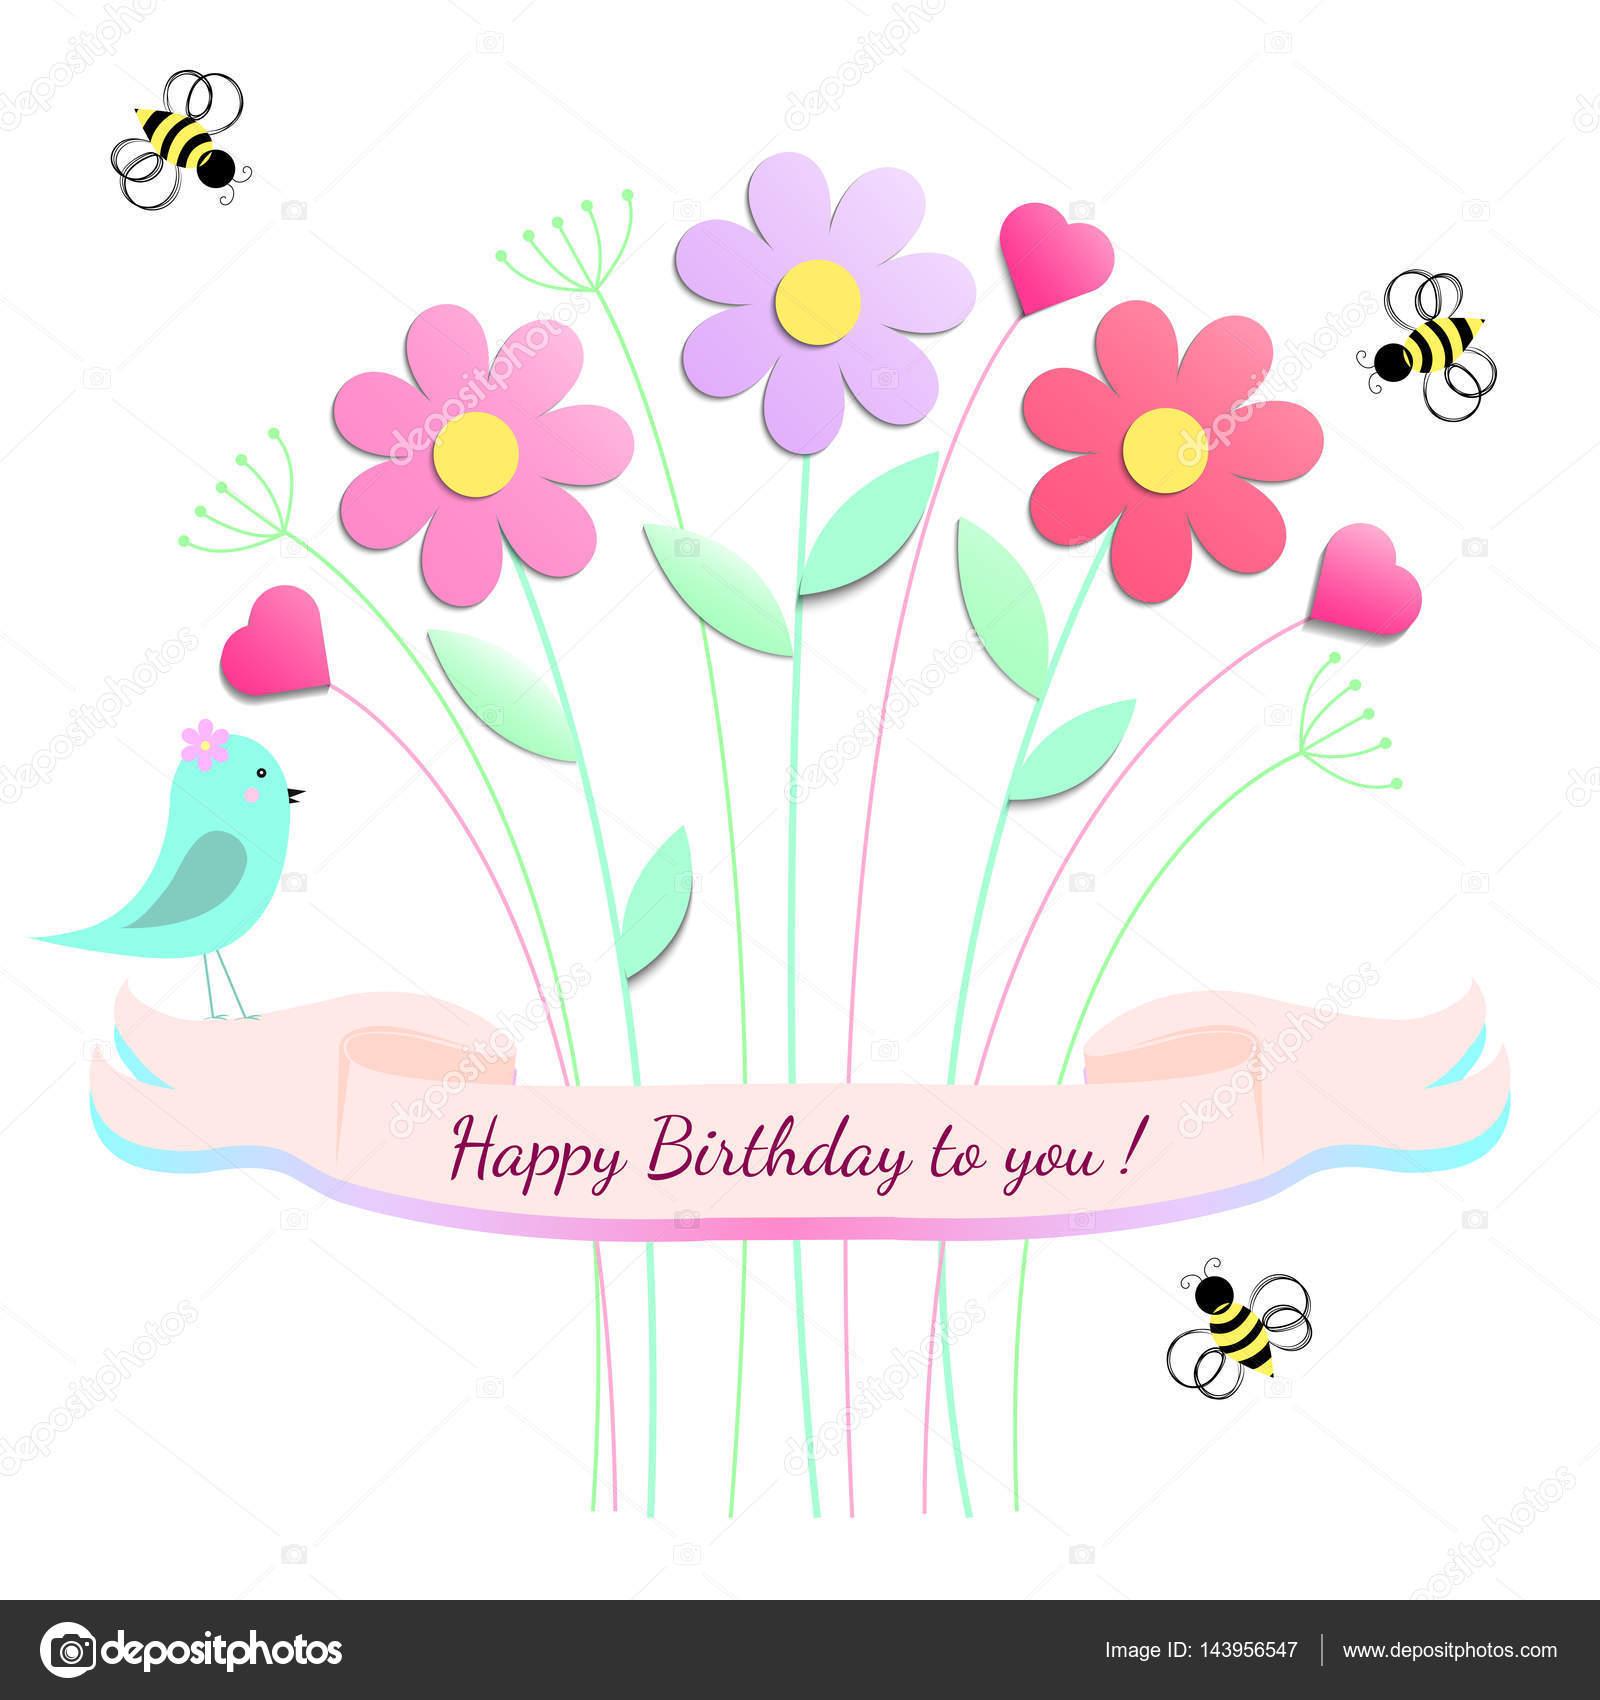 Happy birthday greeting card design with flowers bird and bee happy birthday greeting card design with flowers bird and bee vector illustration stock izmirmasajfo